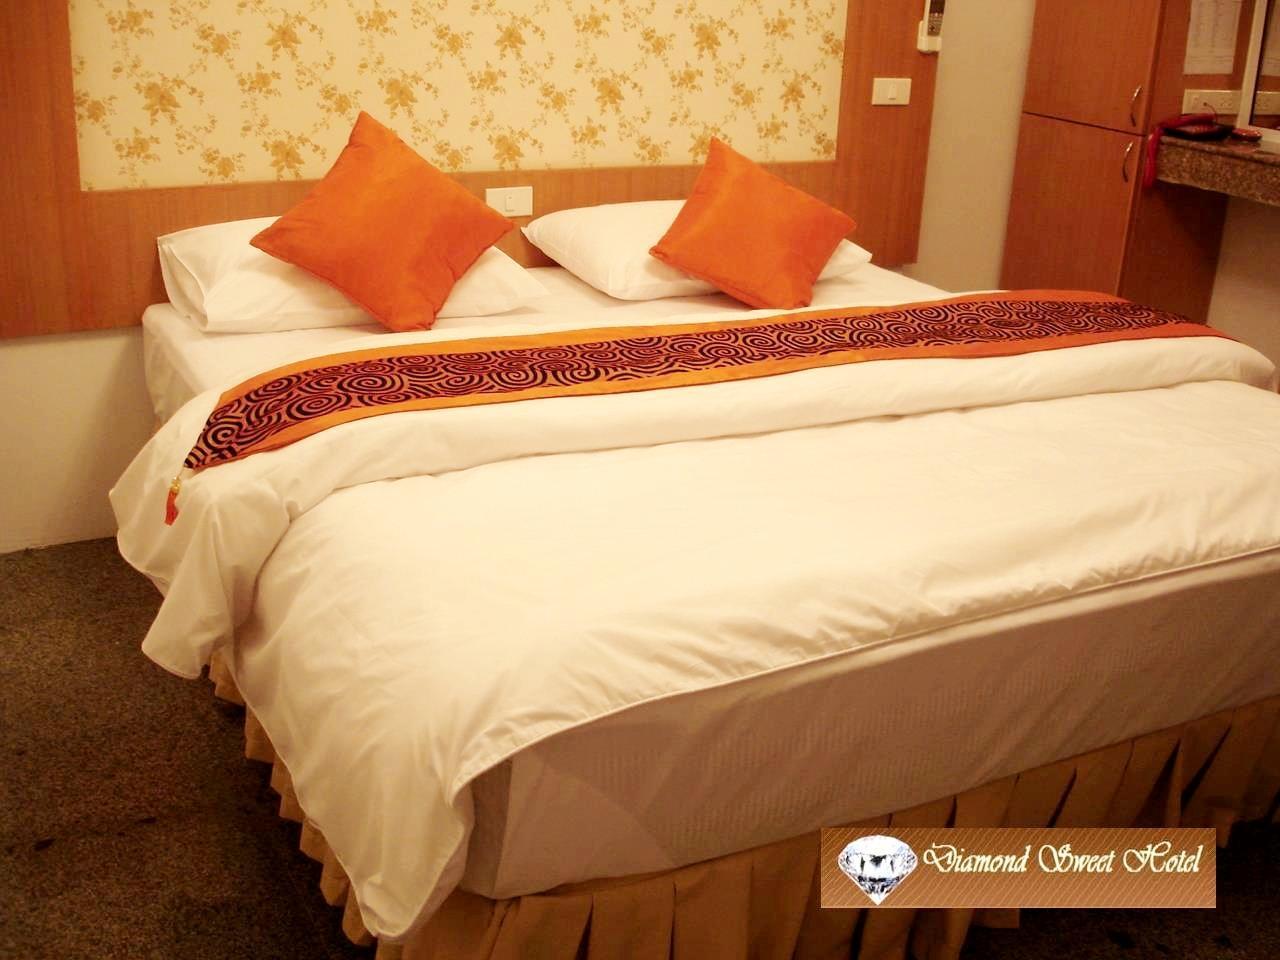 Diamond Sweet Hotel   Superior King Bed